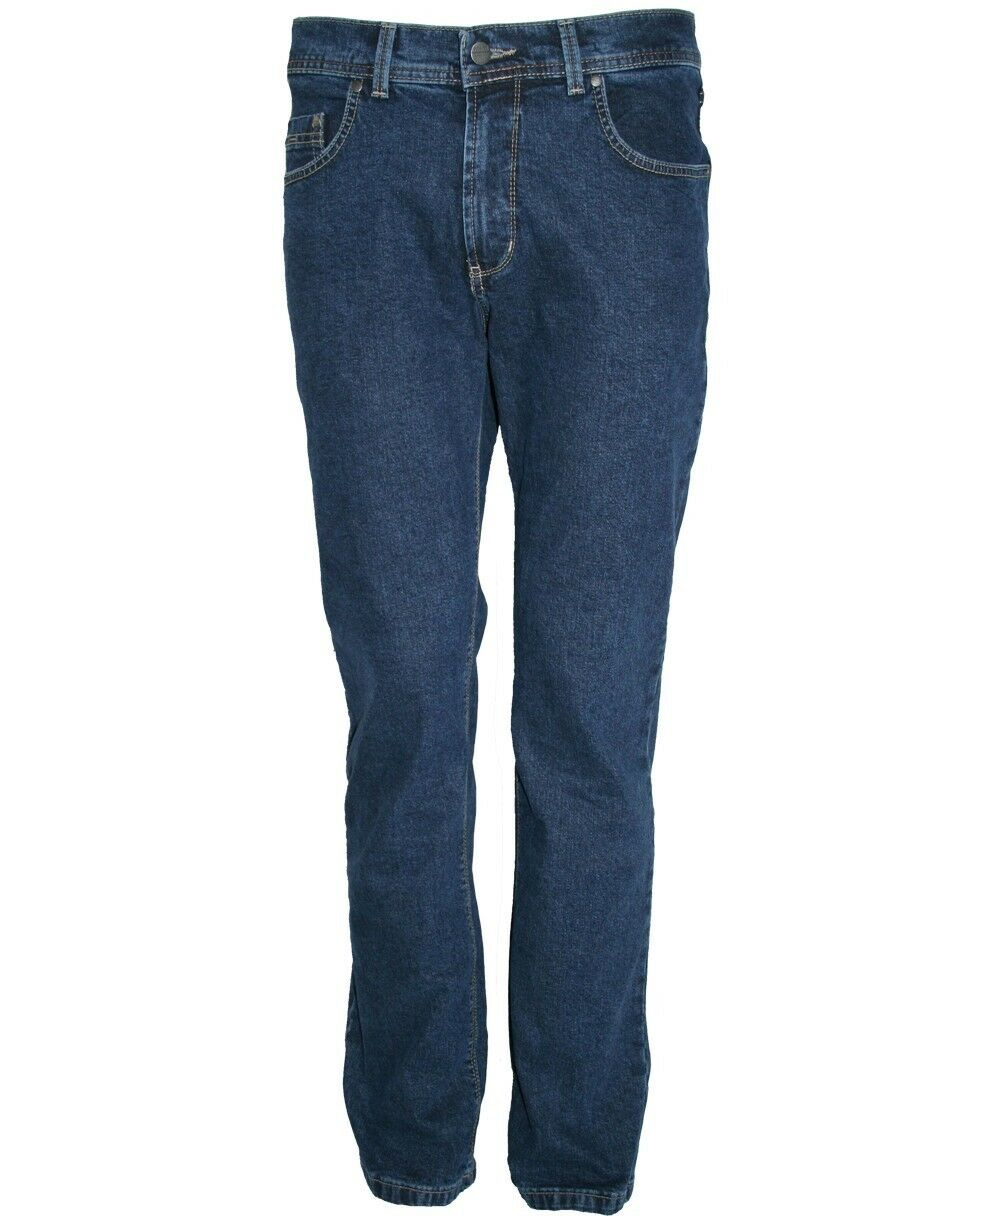 Pioneer Jeans 933.04.1680 - Rando dunkelblue   dark stone